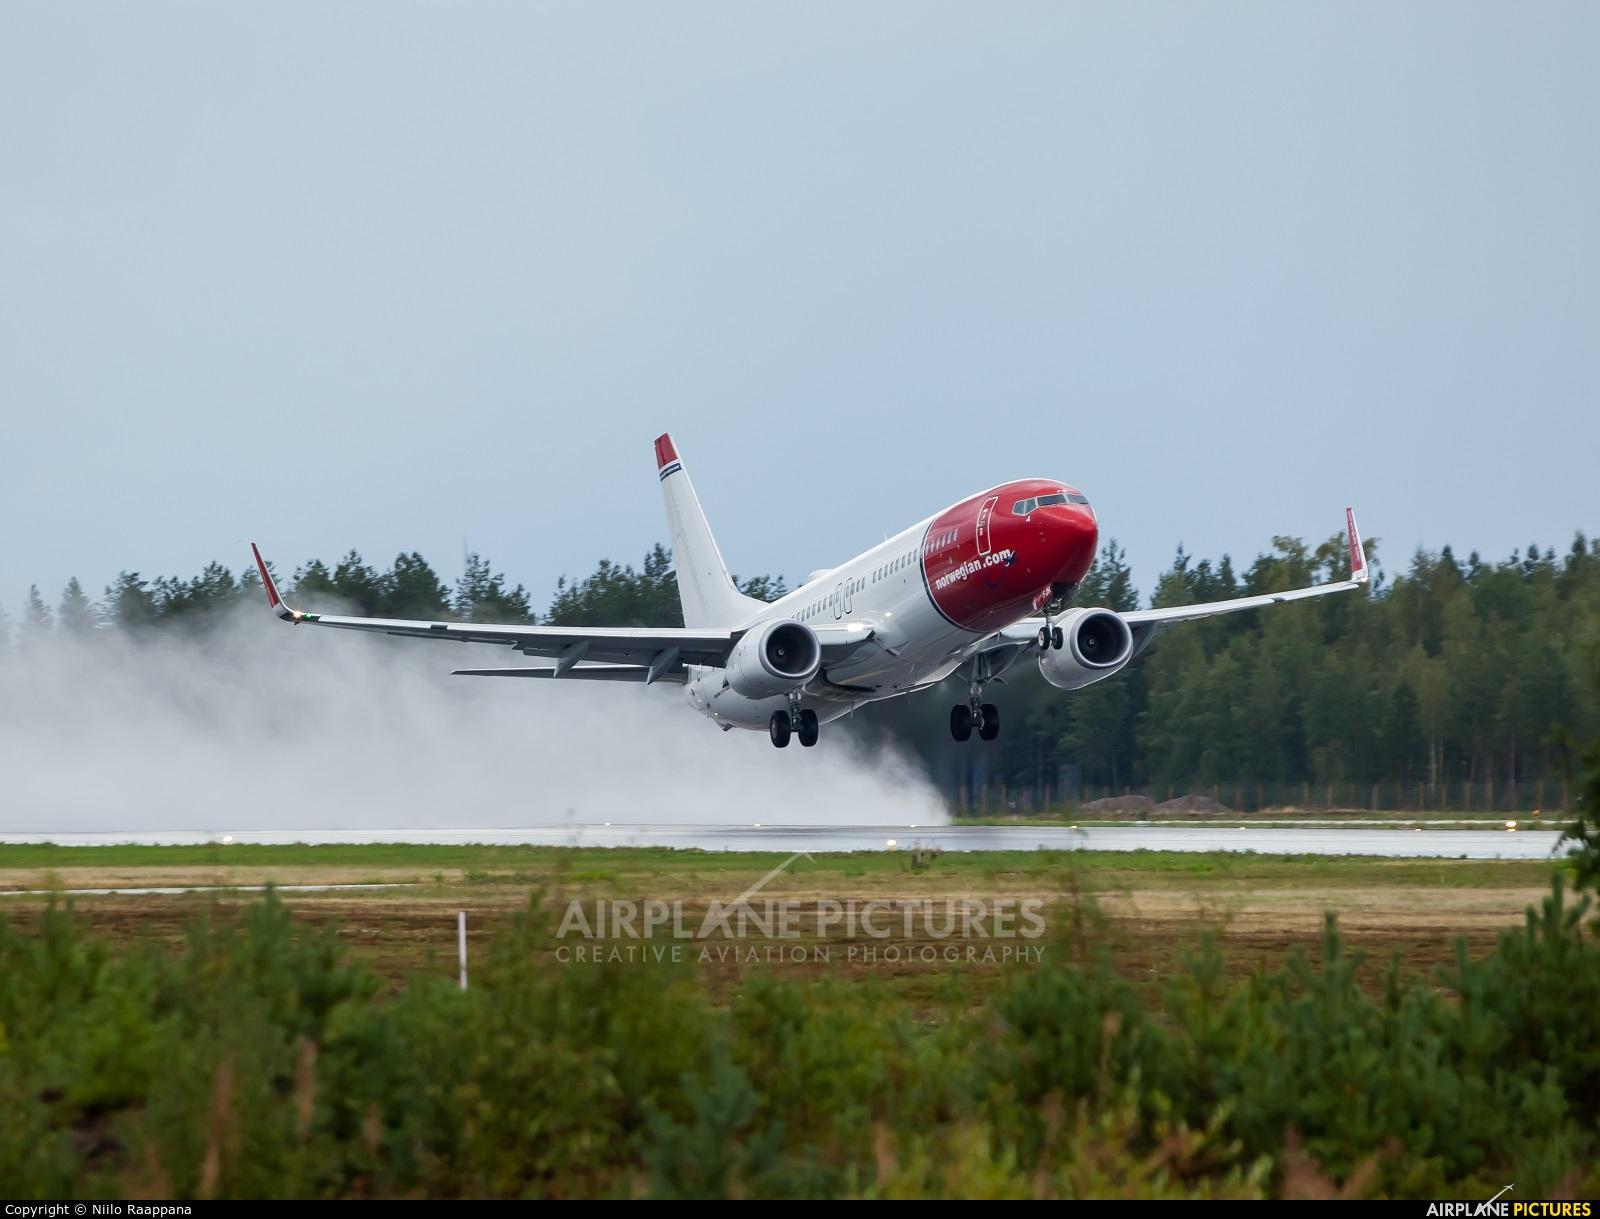 Norwegian Air International EI-FJN aircraft at Oulu